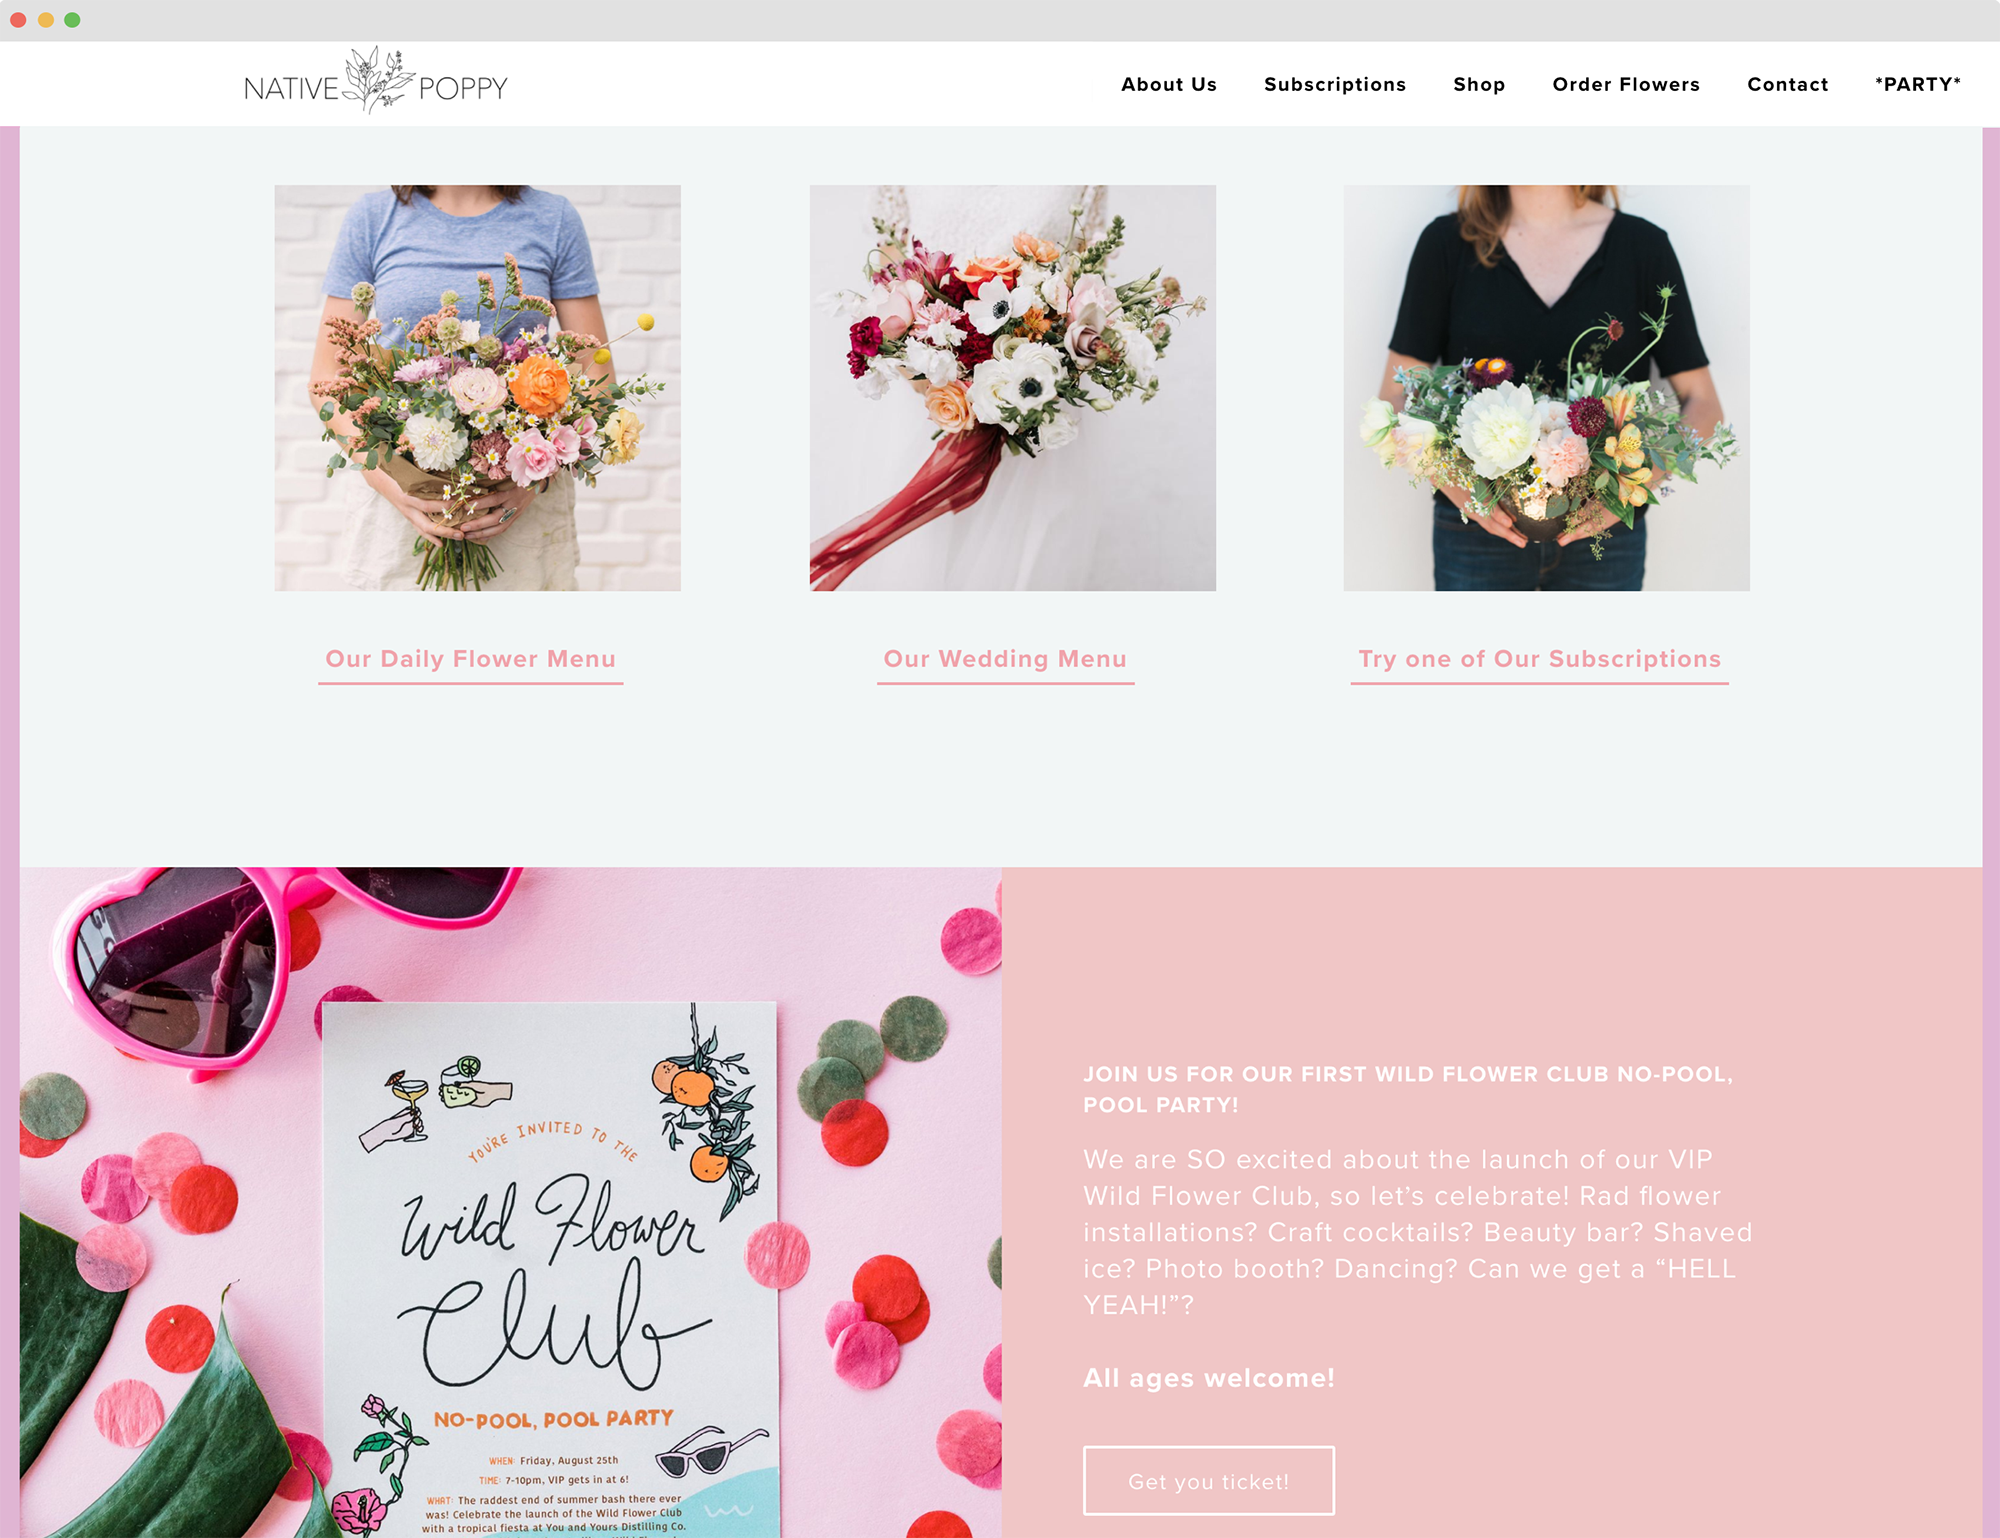 site design for native poppy flower shop